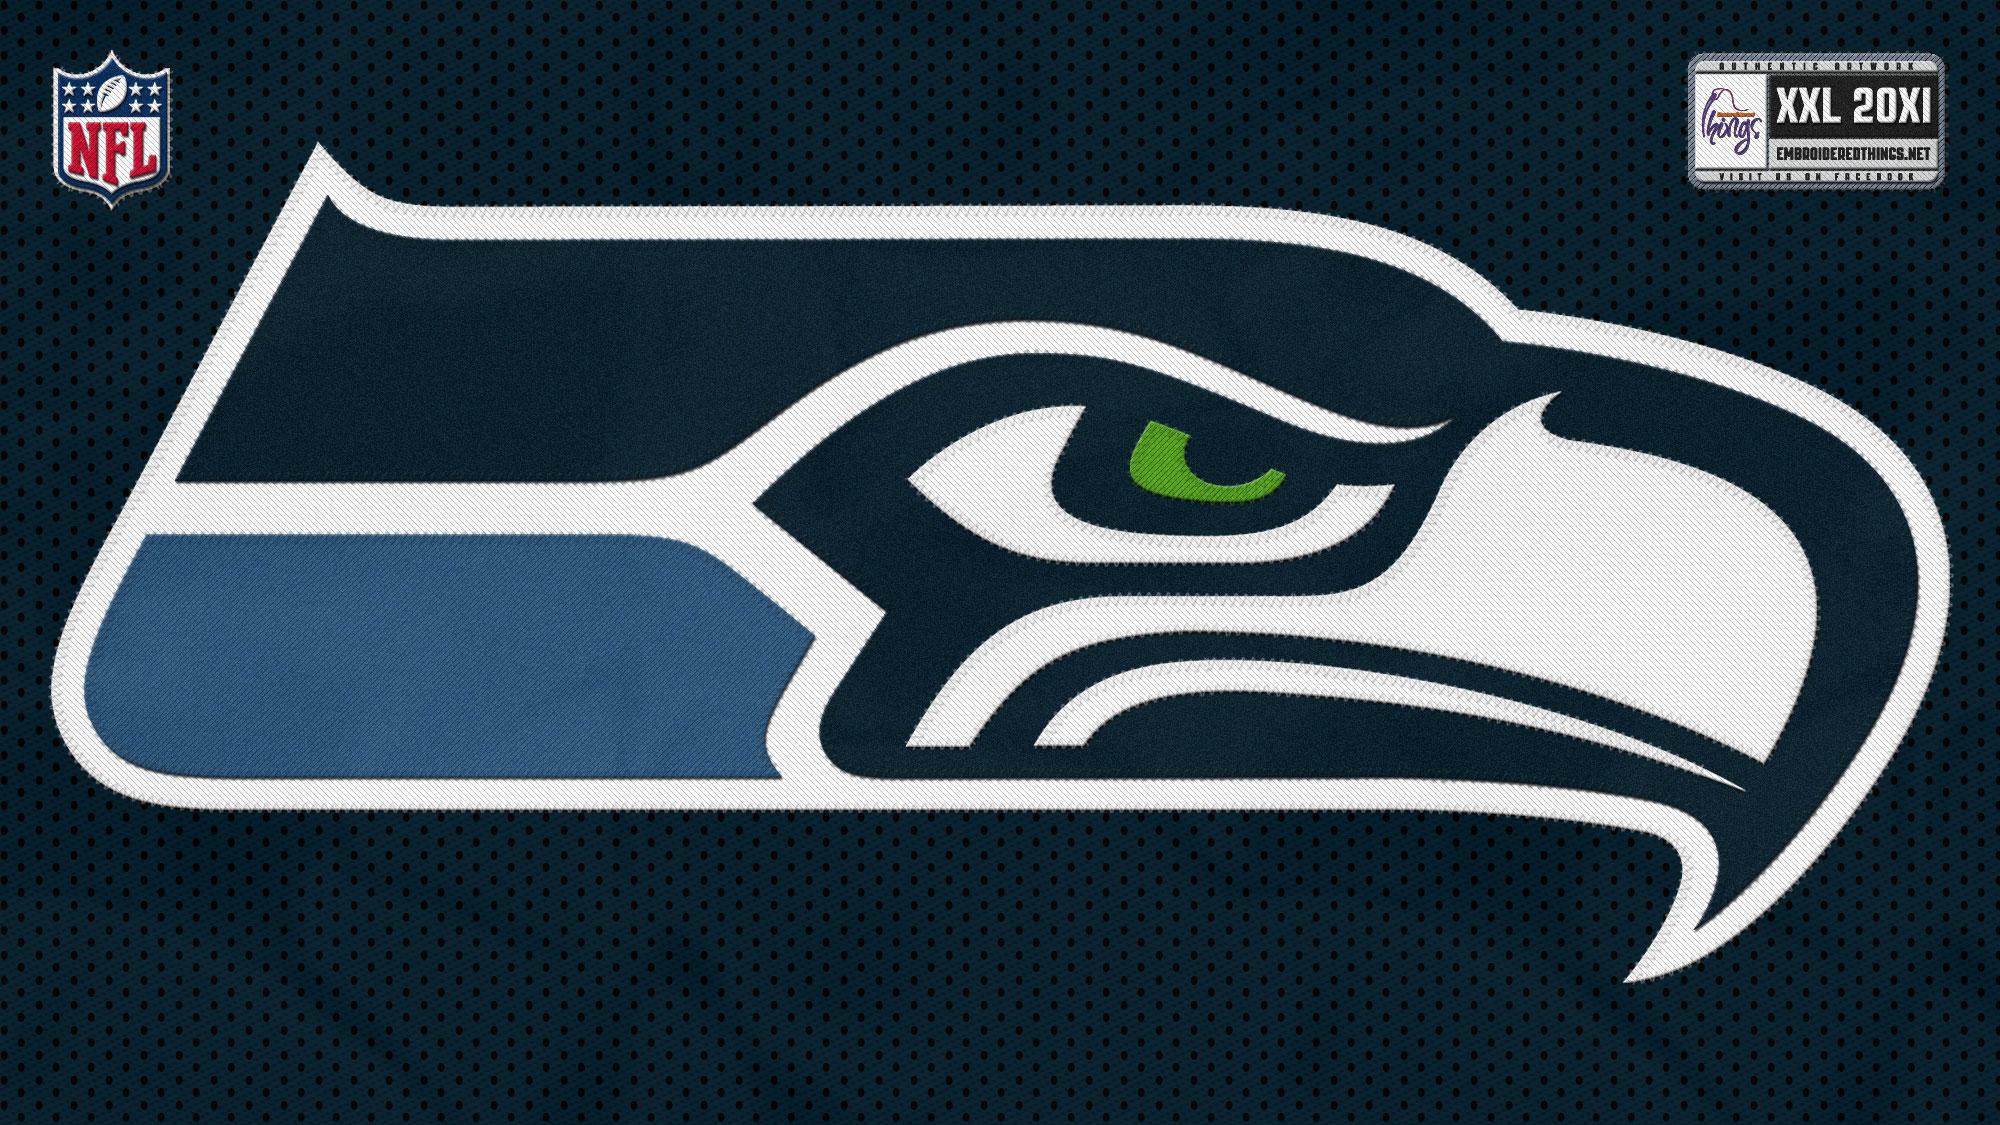 fff6527c2 Seattle Seahawks nfl football sport logo wallpaper 2000x1125 82491 2000x1125